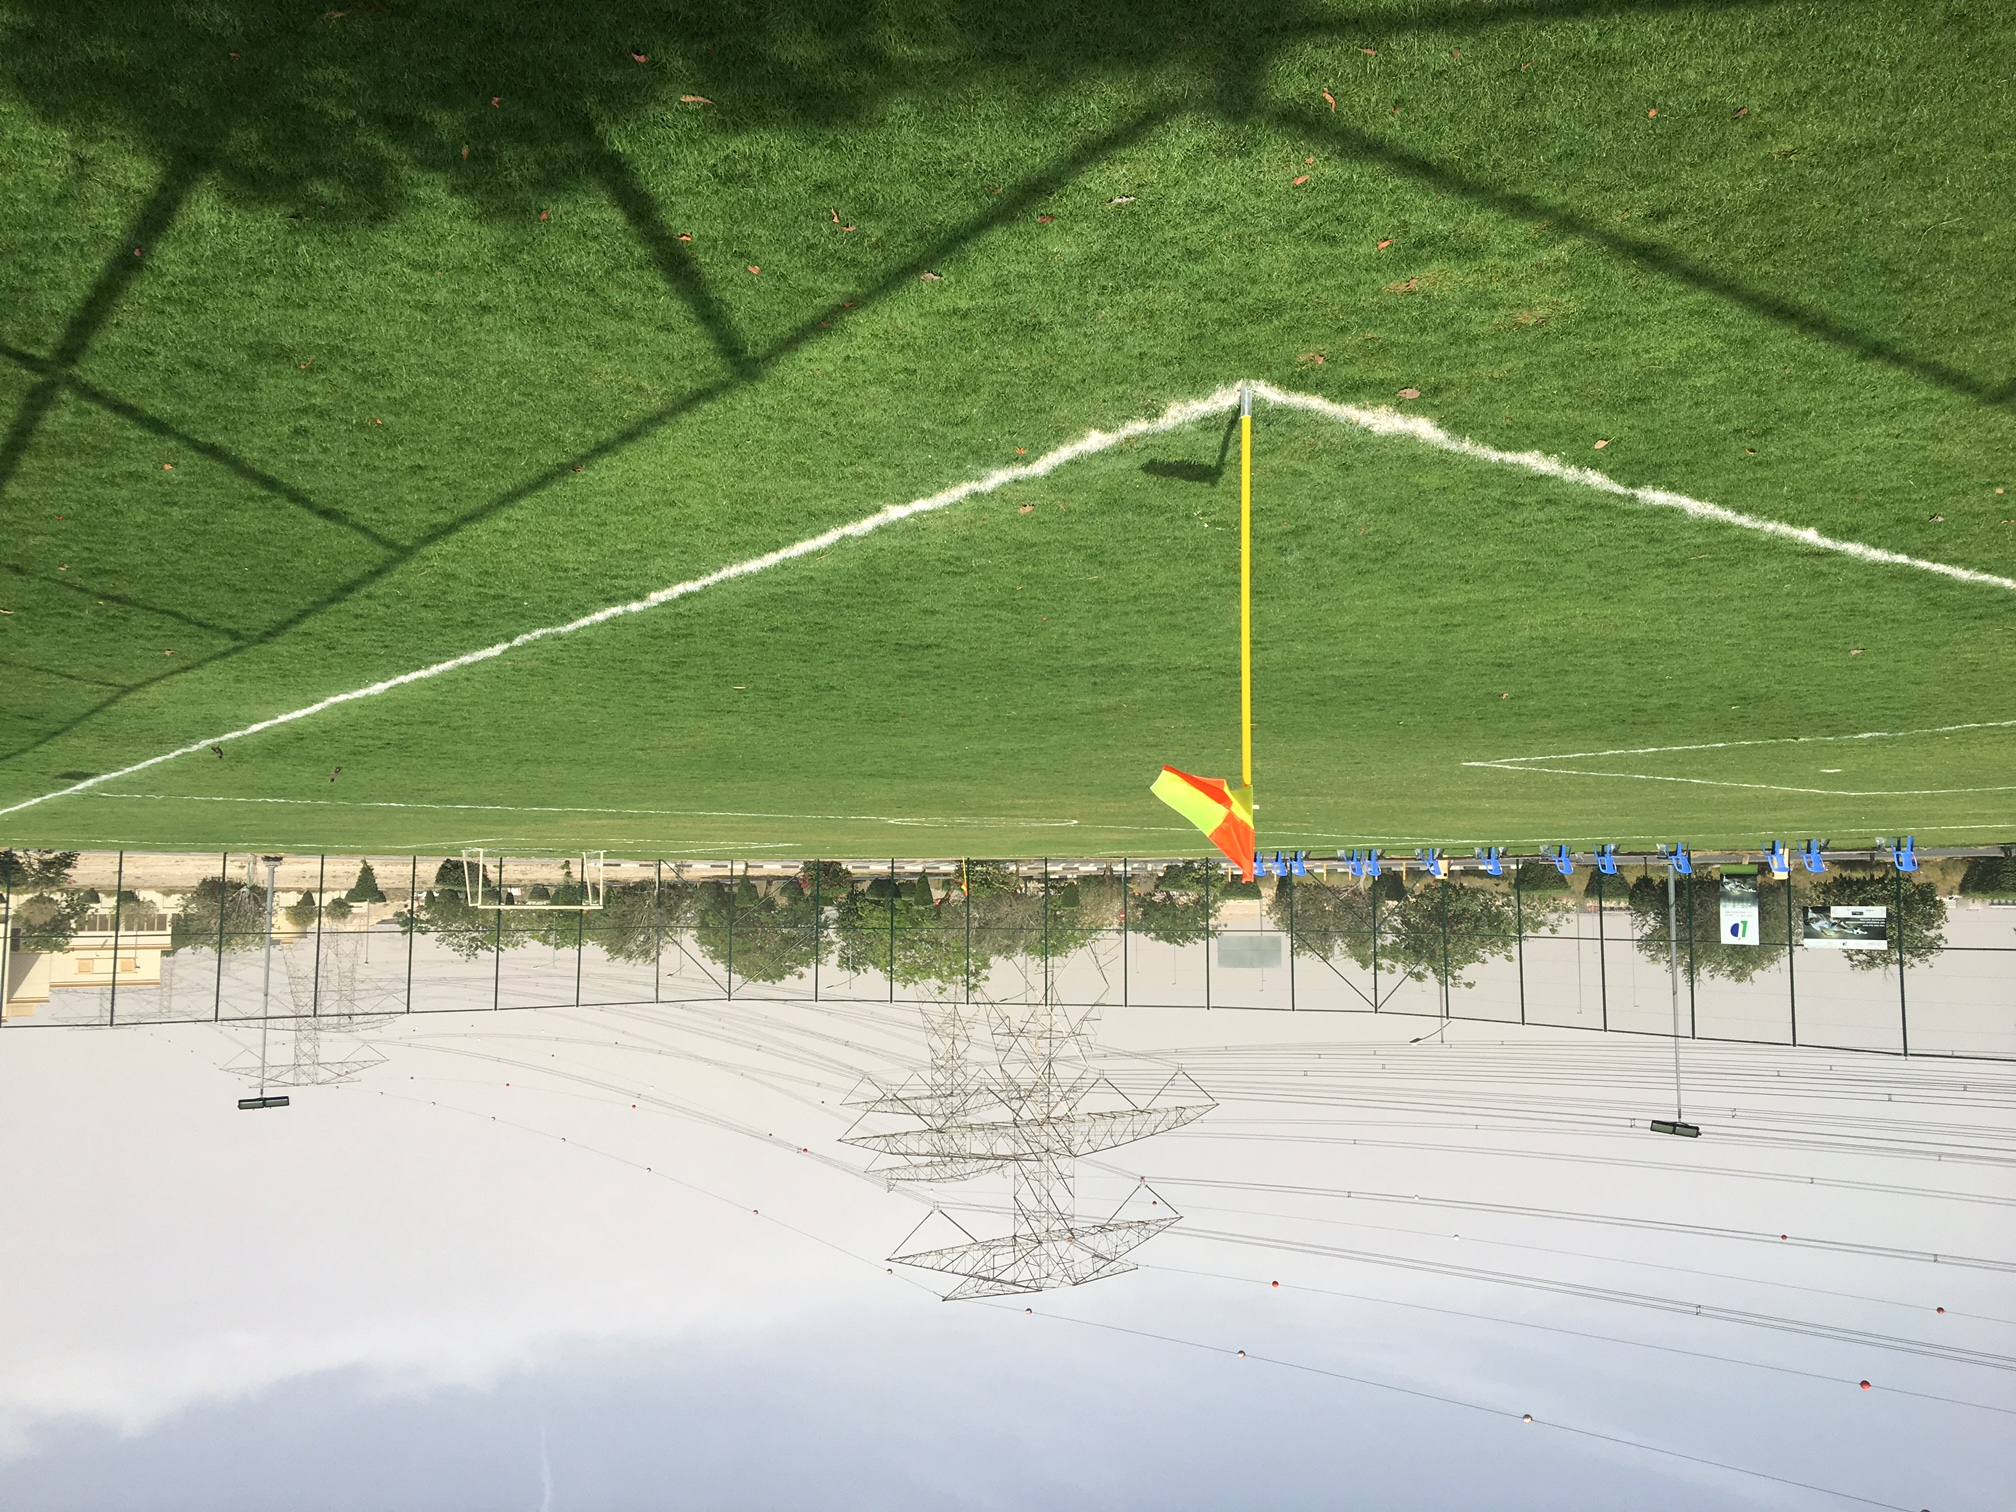 DIP Soccer Field - Daylight C2